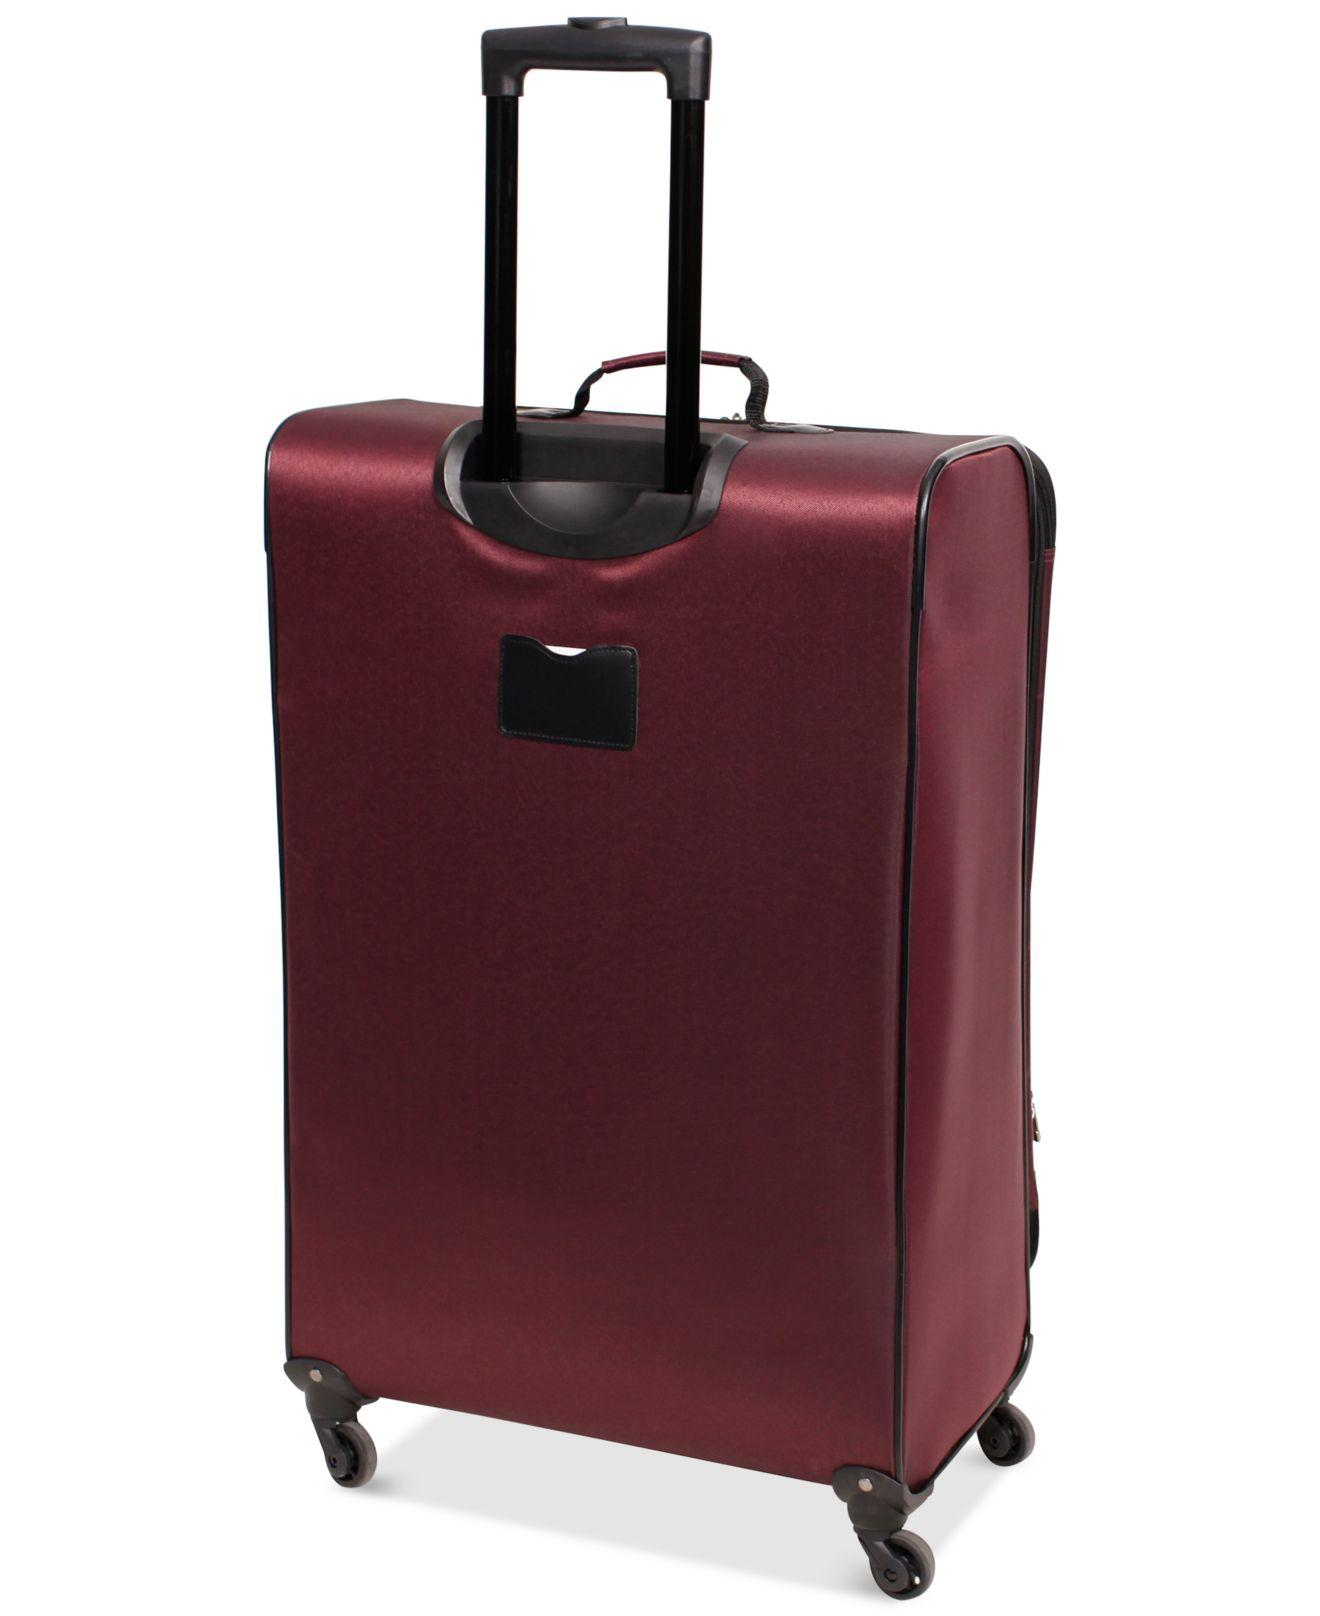 07e711521 Jessica Simpson Tag Daytona 5-pc. Luggage Set, Created For Macy's in ...